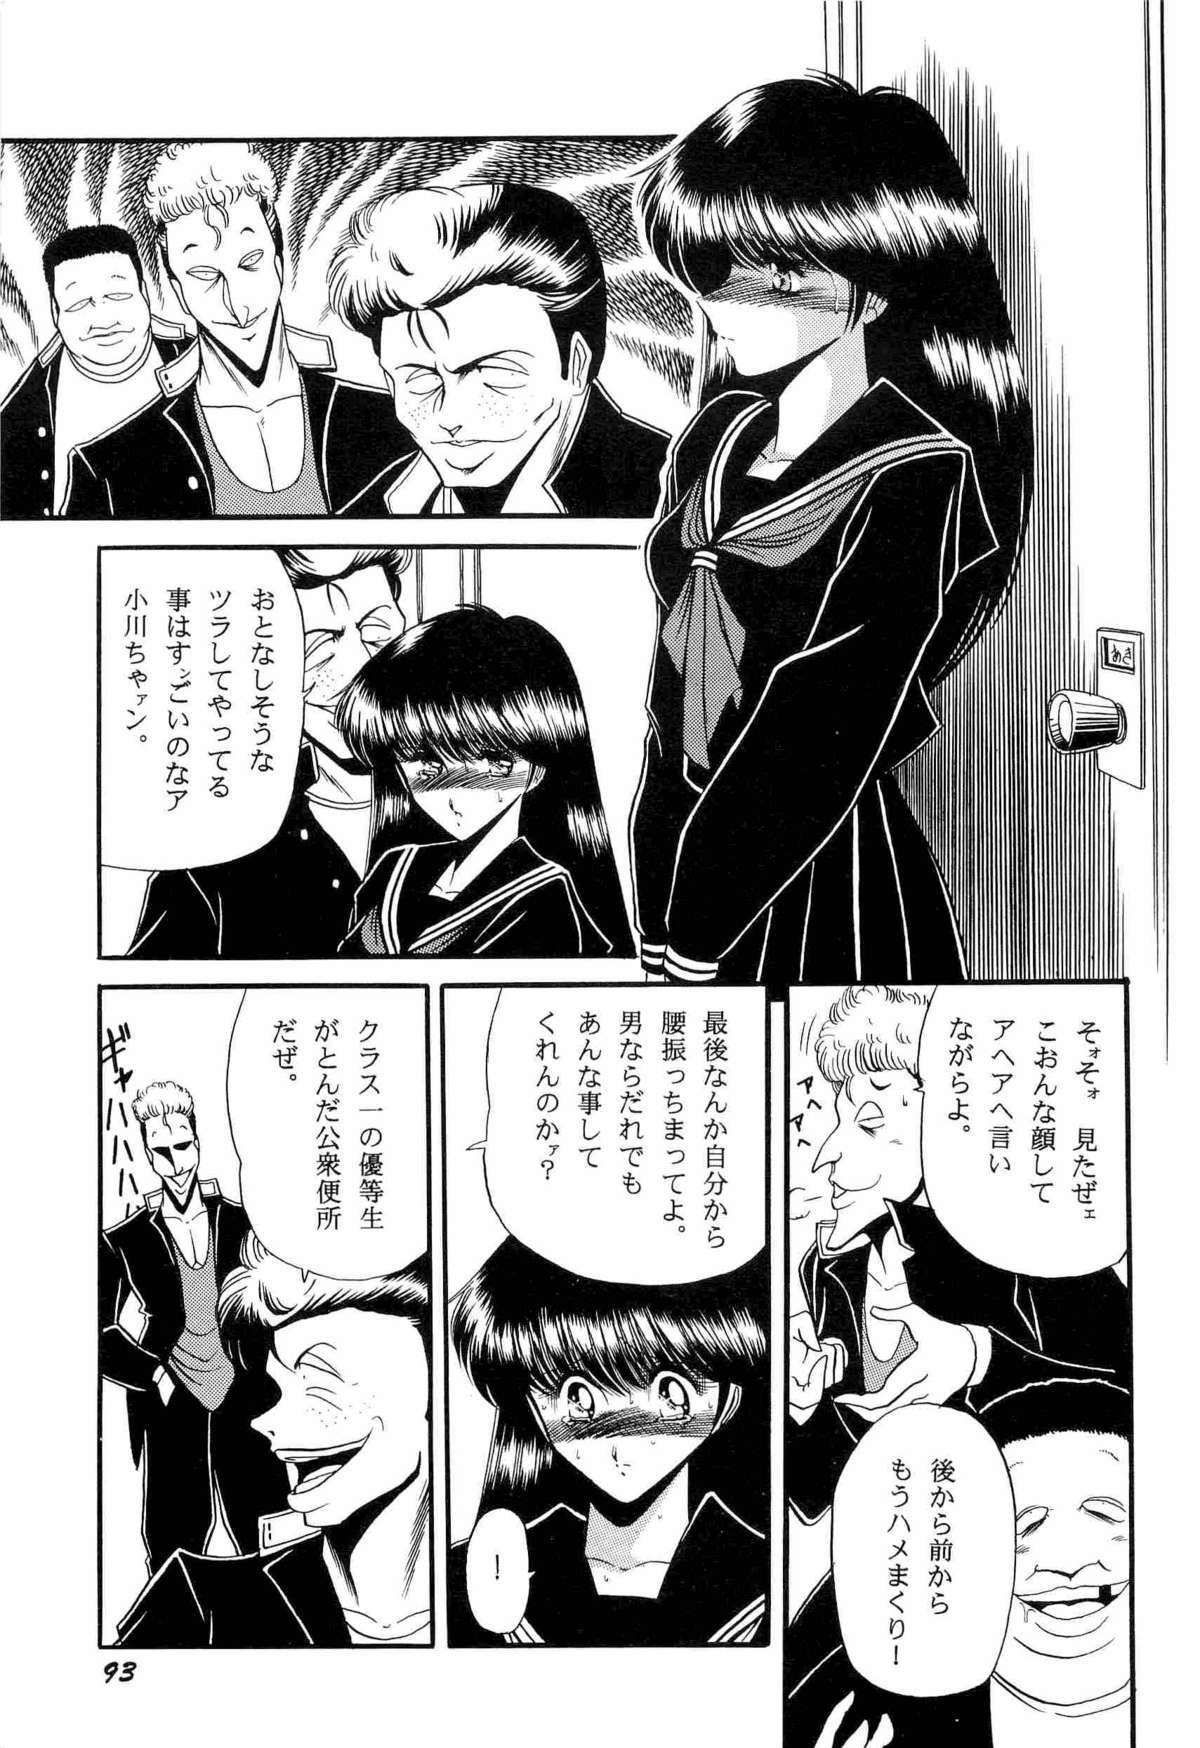 Bisyoujo Anthology '93 jyoukan 95